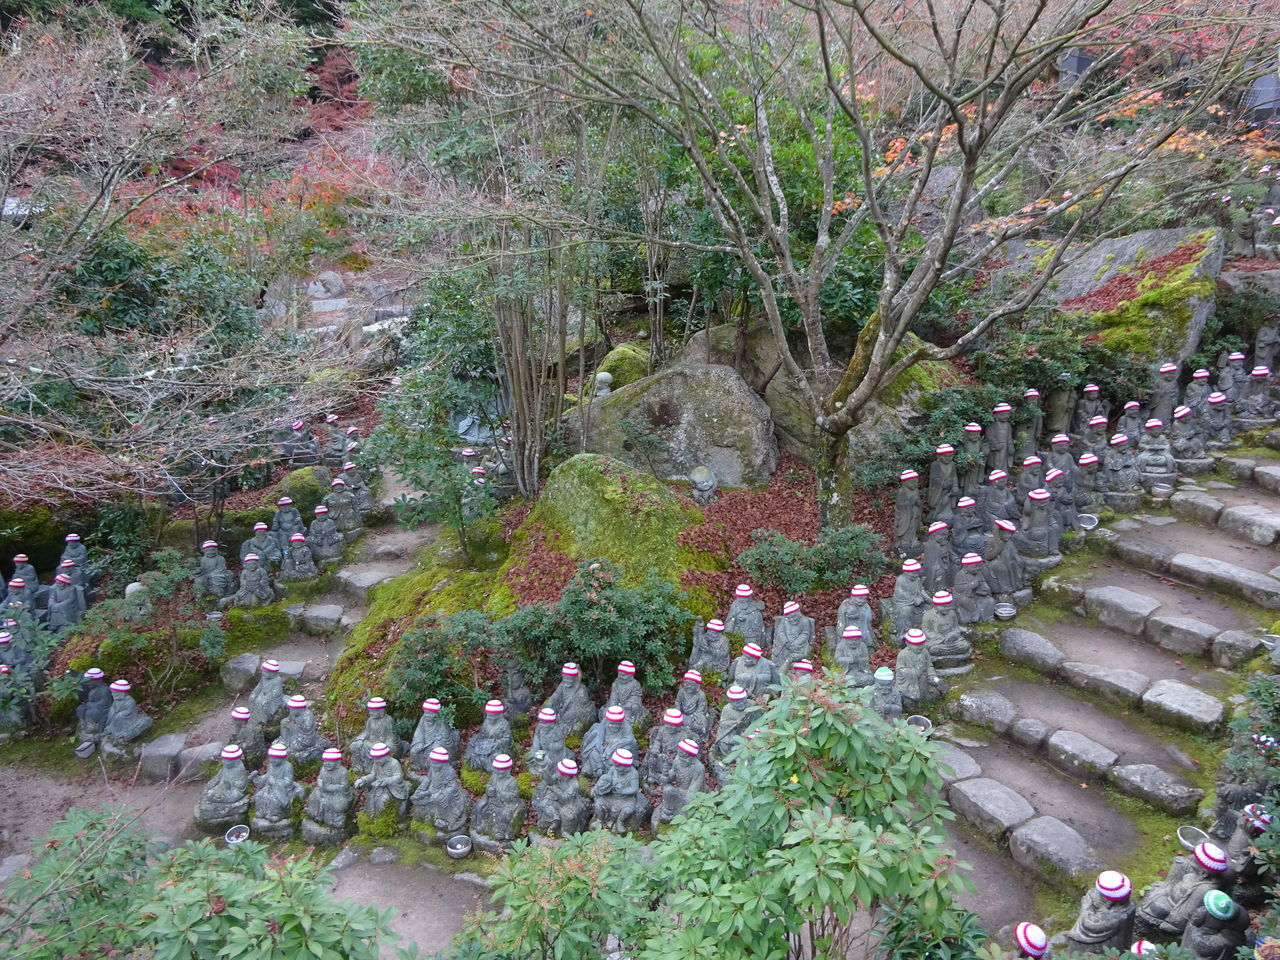 Jizo Large Group Of People